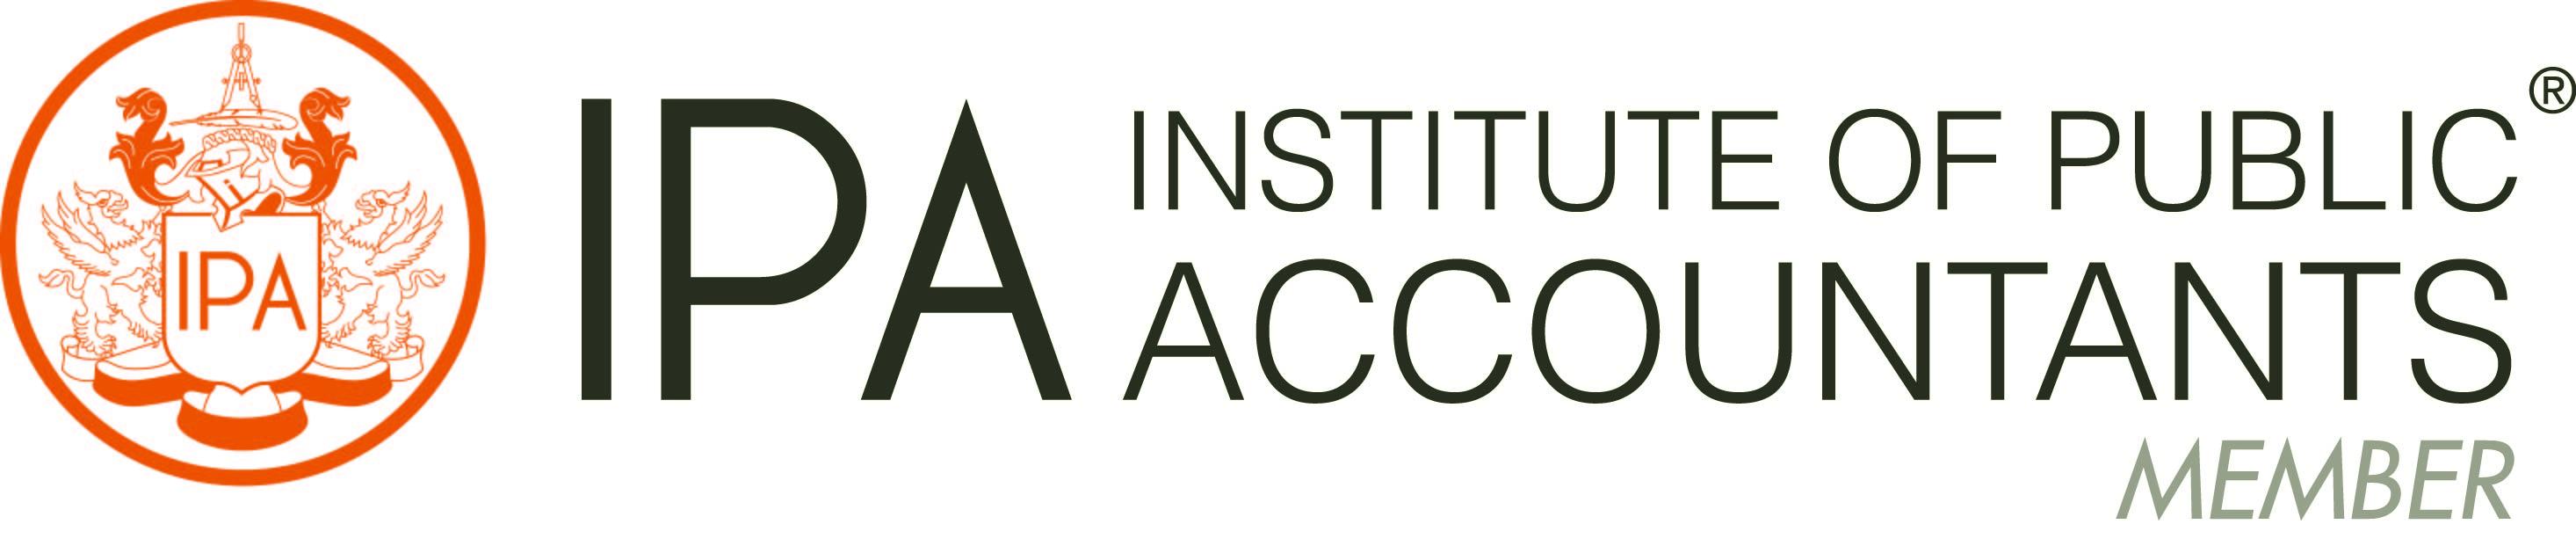 IPA - Institute of Public Accountants Member